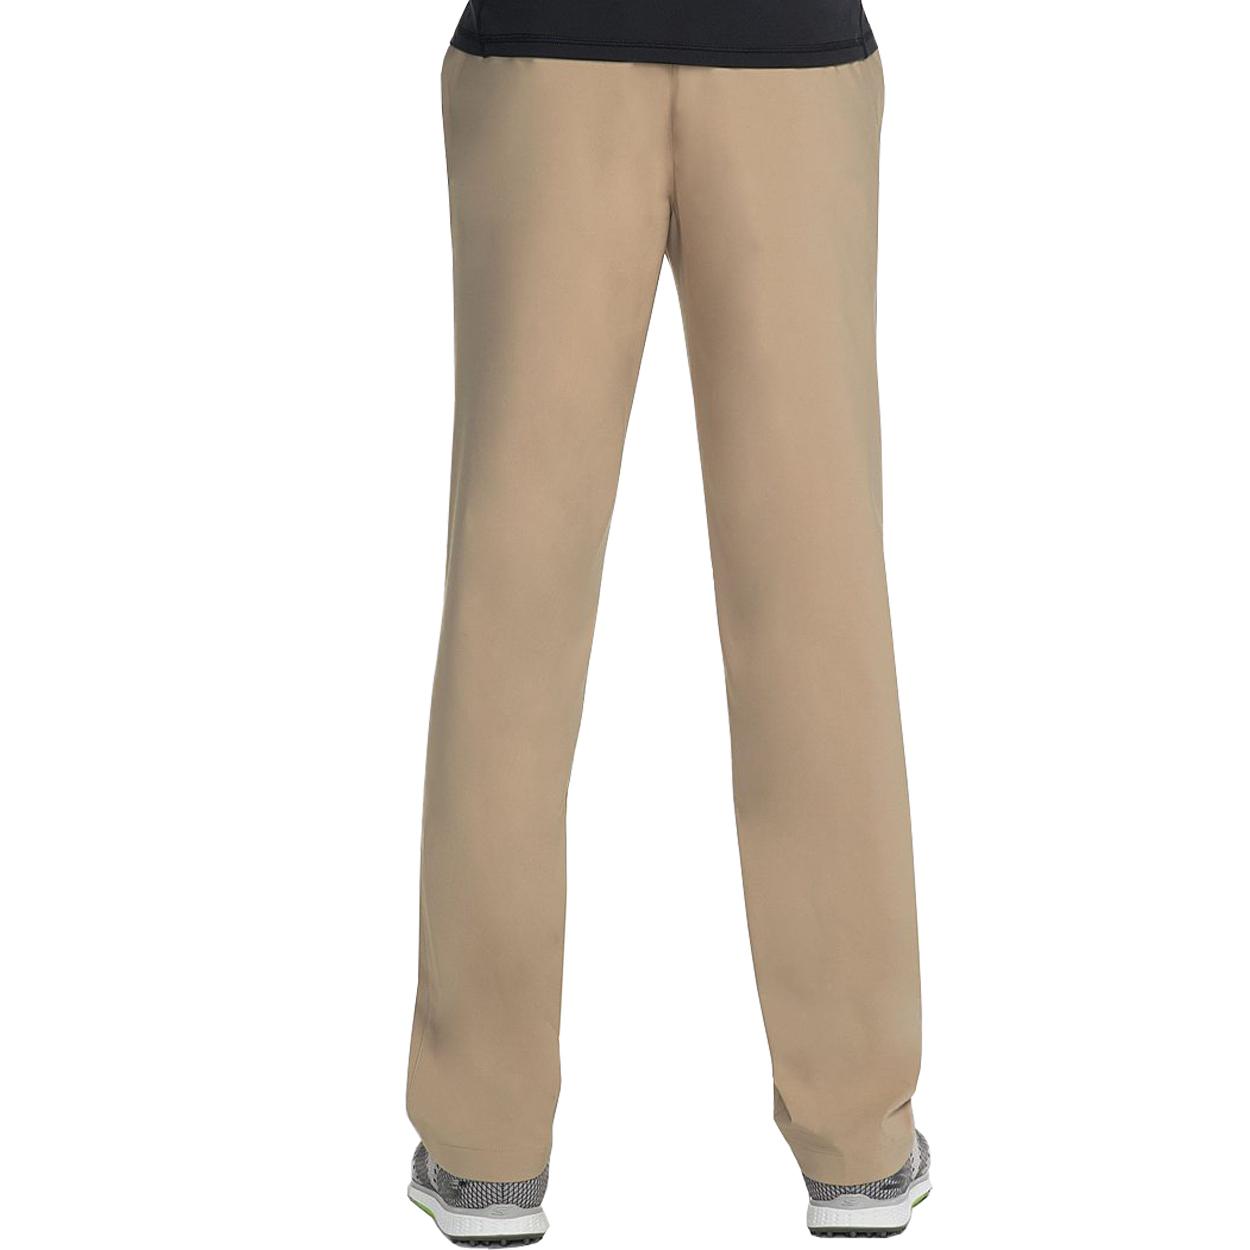 Skechers-Golf-Men-039-s-Rocklin-II-Chino-Pants-Brand-New thumbnail 6